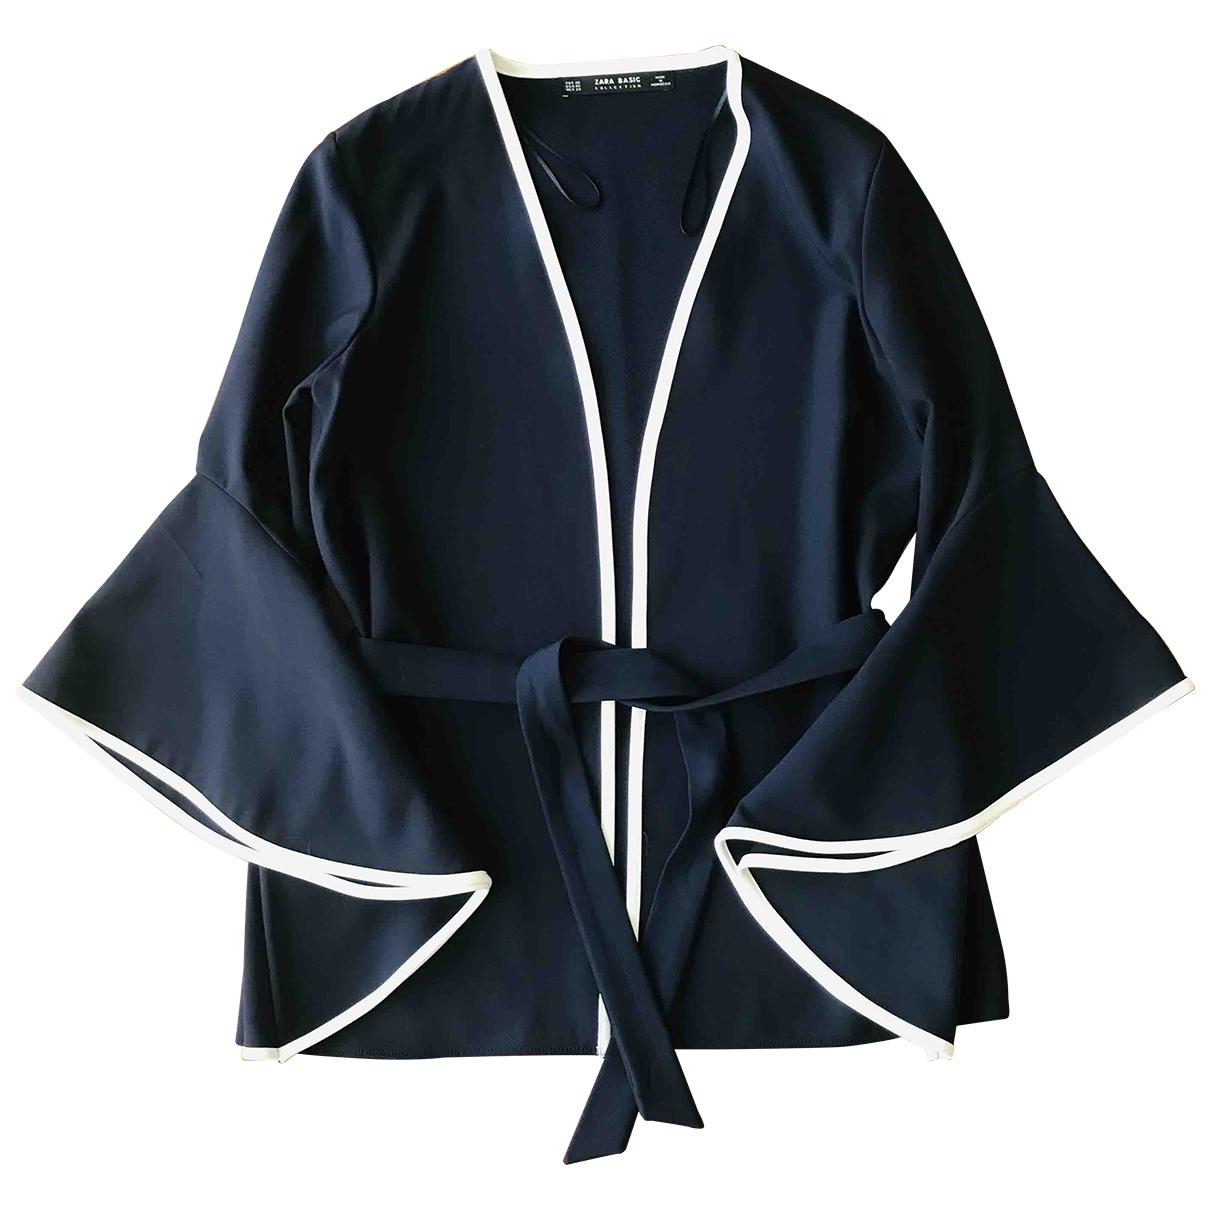 Zara \N Navy jacket for Women XS International